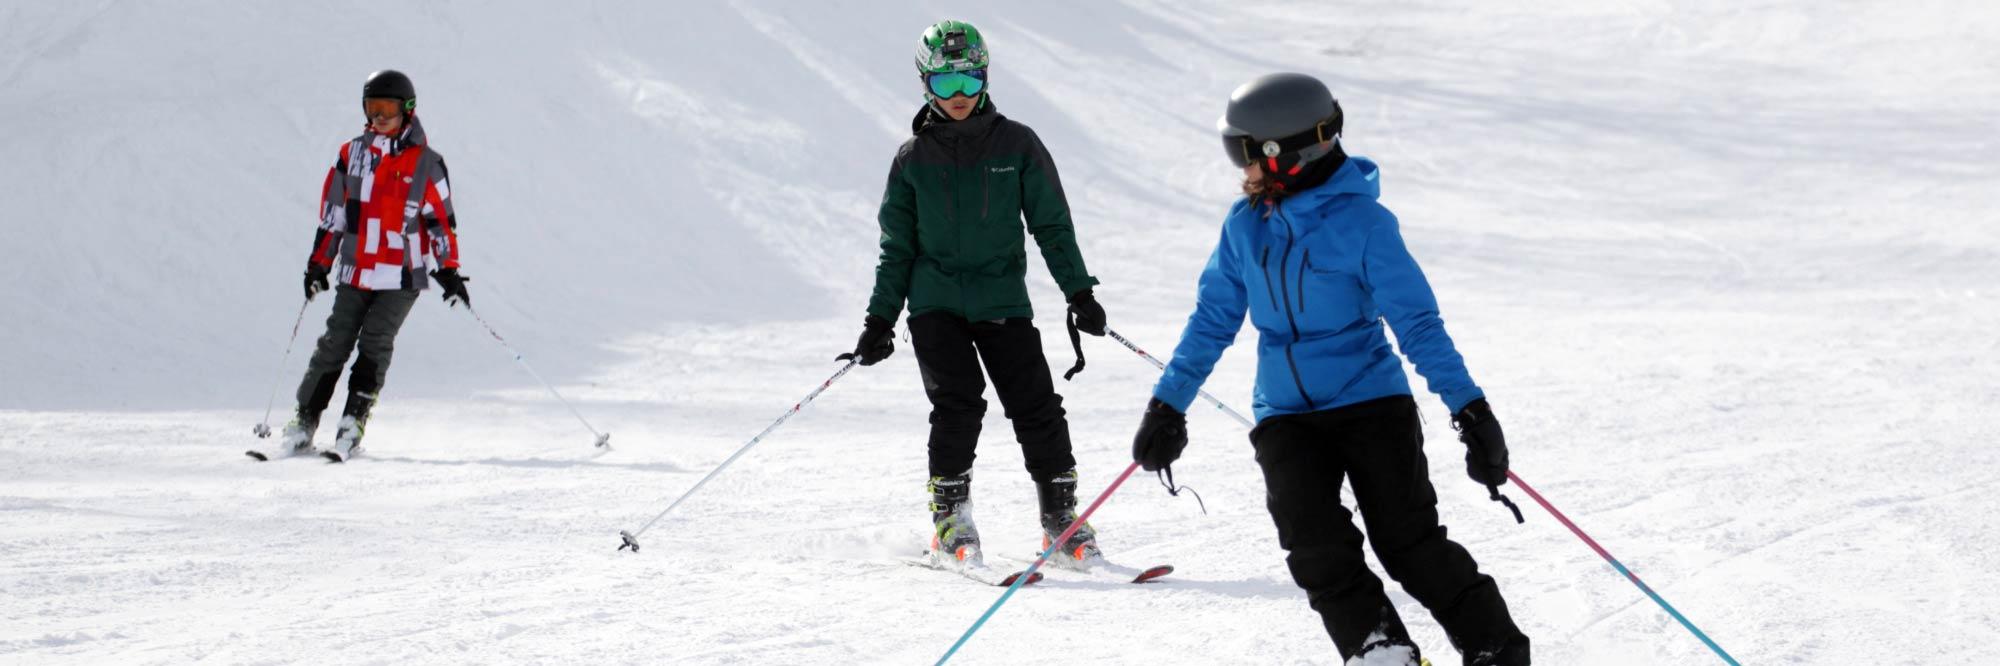 meet at the mountain ski lessons in hakuba